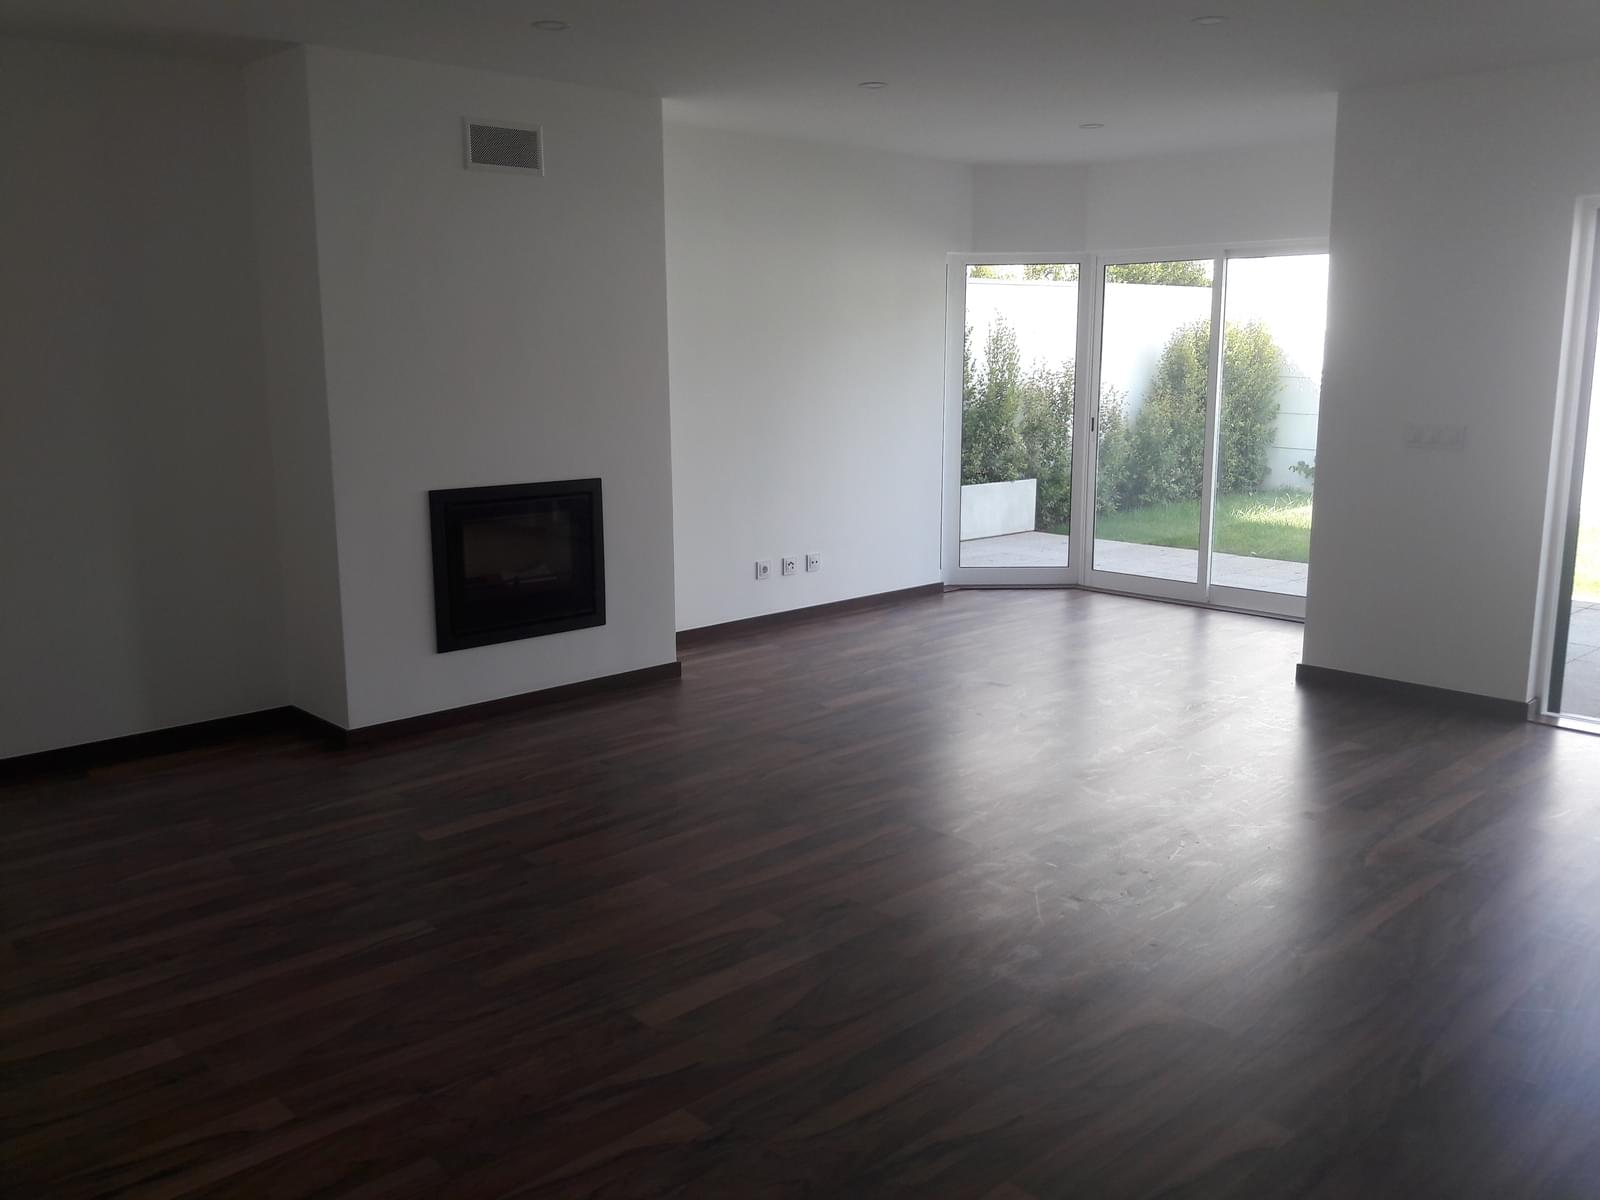 pf18025-apartamento-t3-a36d36bb-e458-428a-95a7-7691988f4005